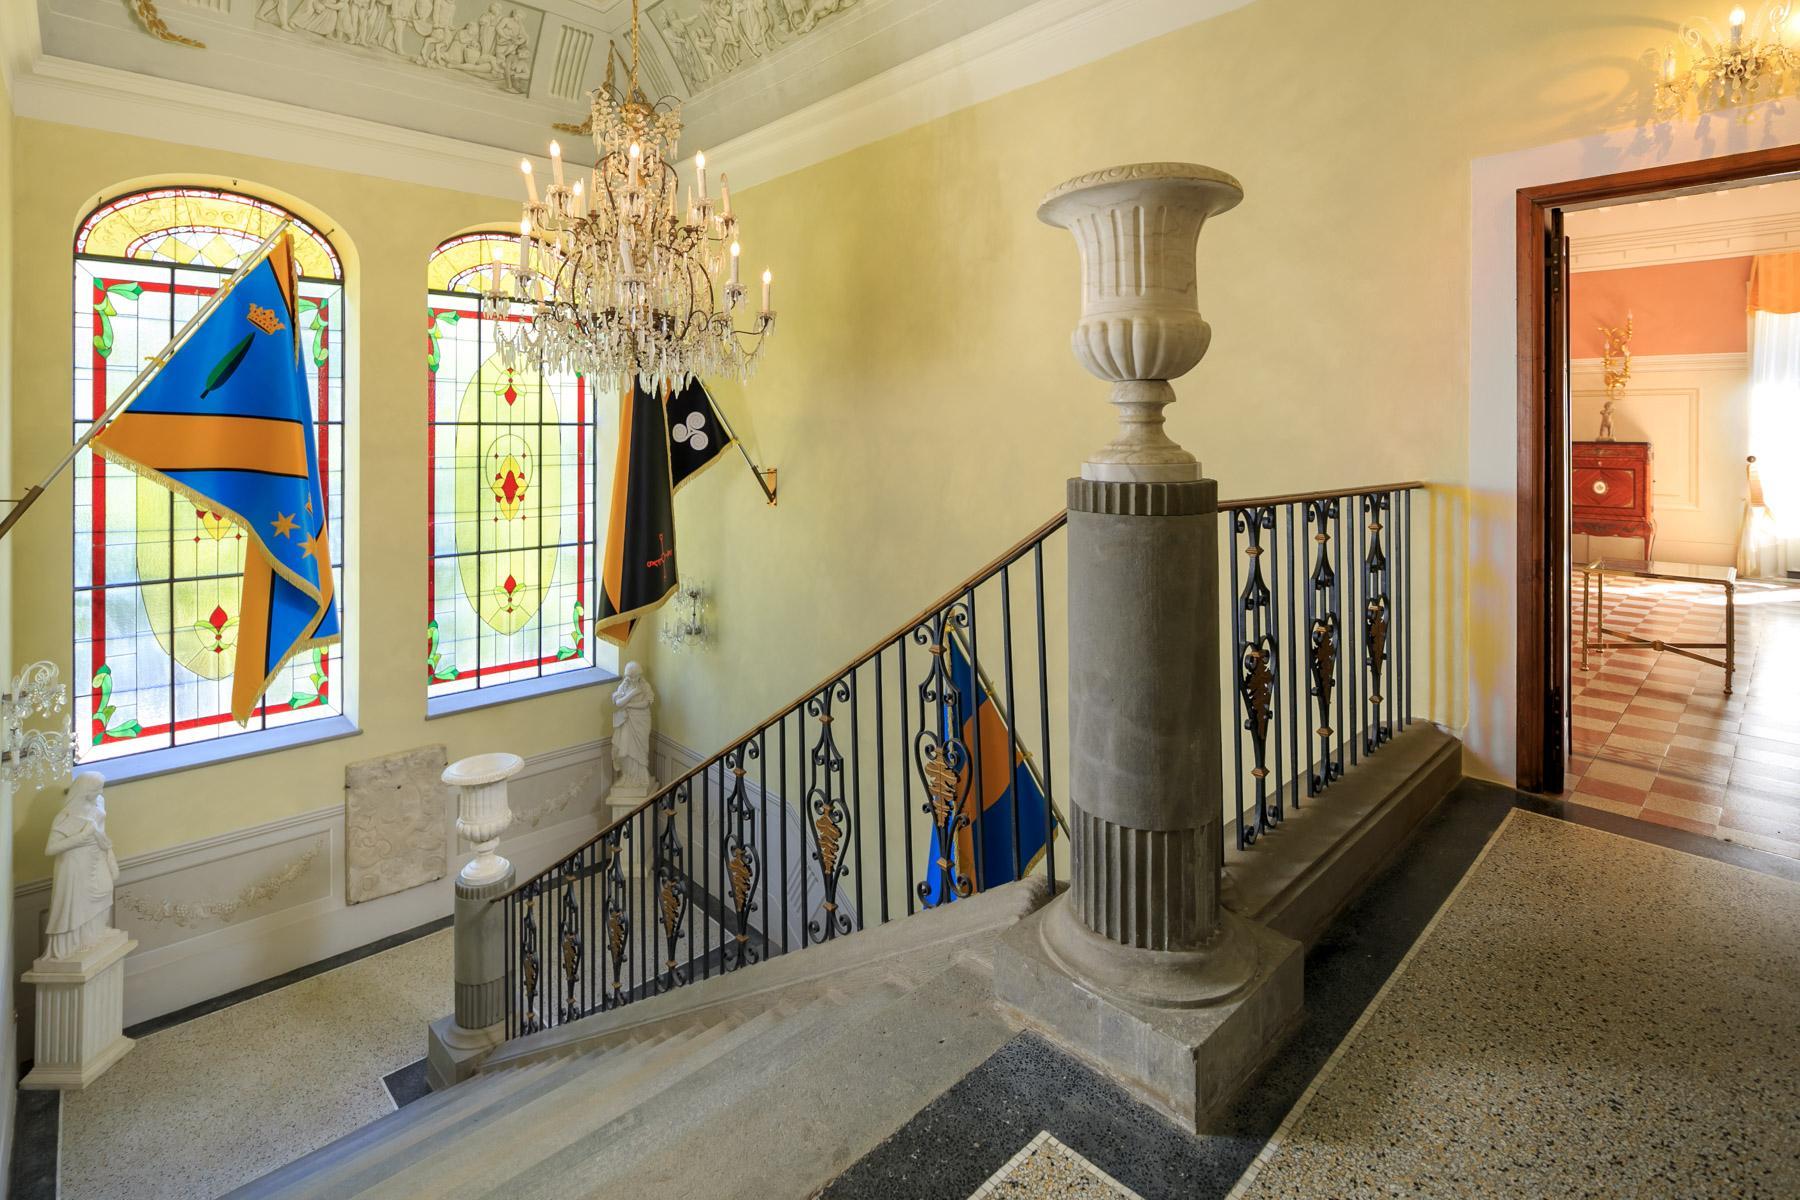 Exquisite 16th century property - 15